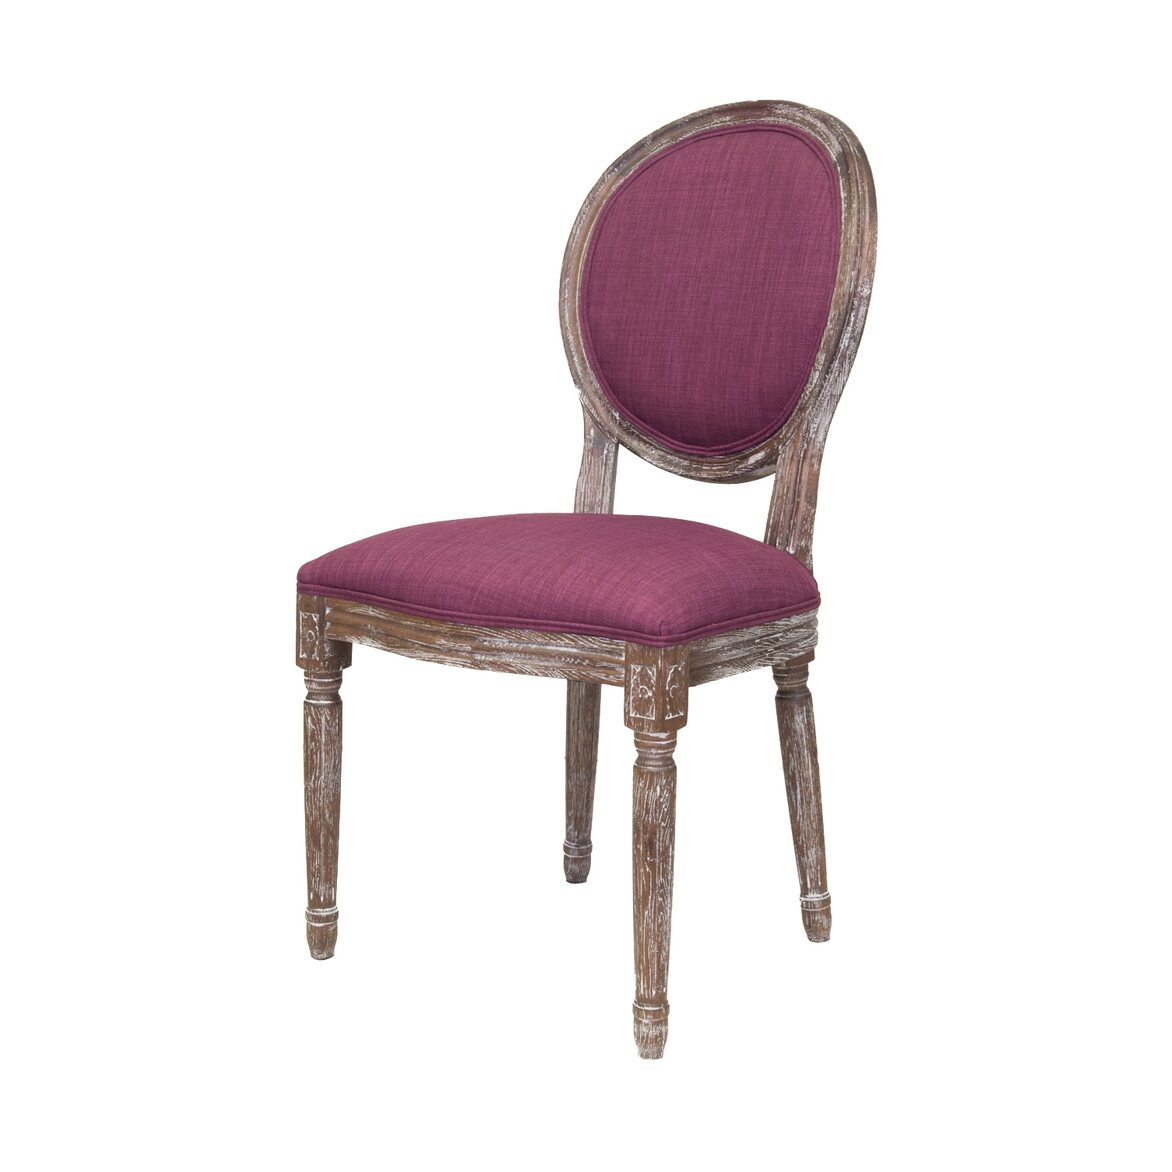 Стул Miro violet 2 | Обеденные стулья Kingsby